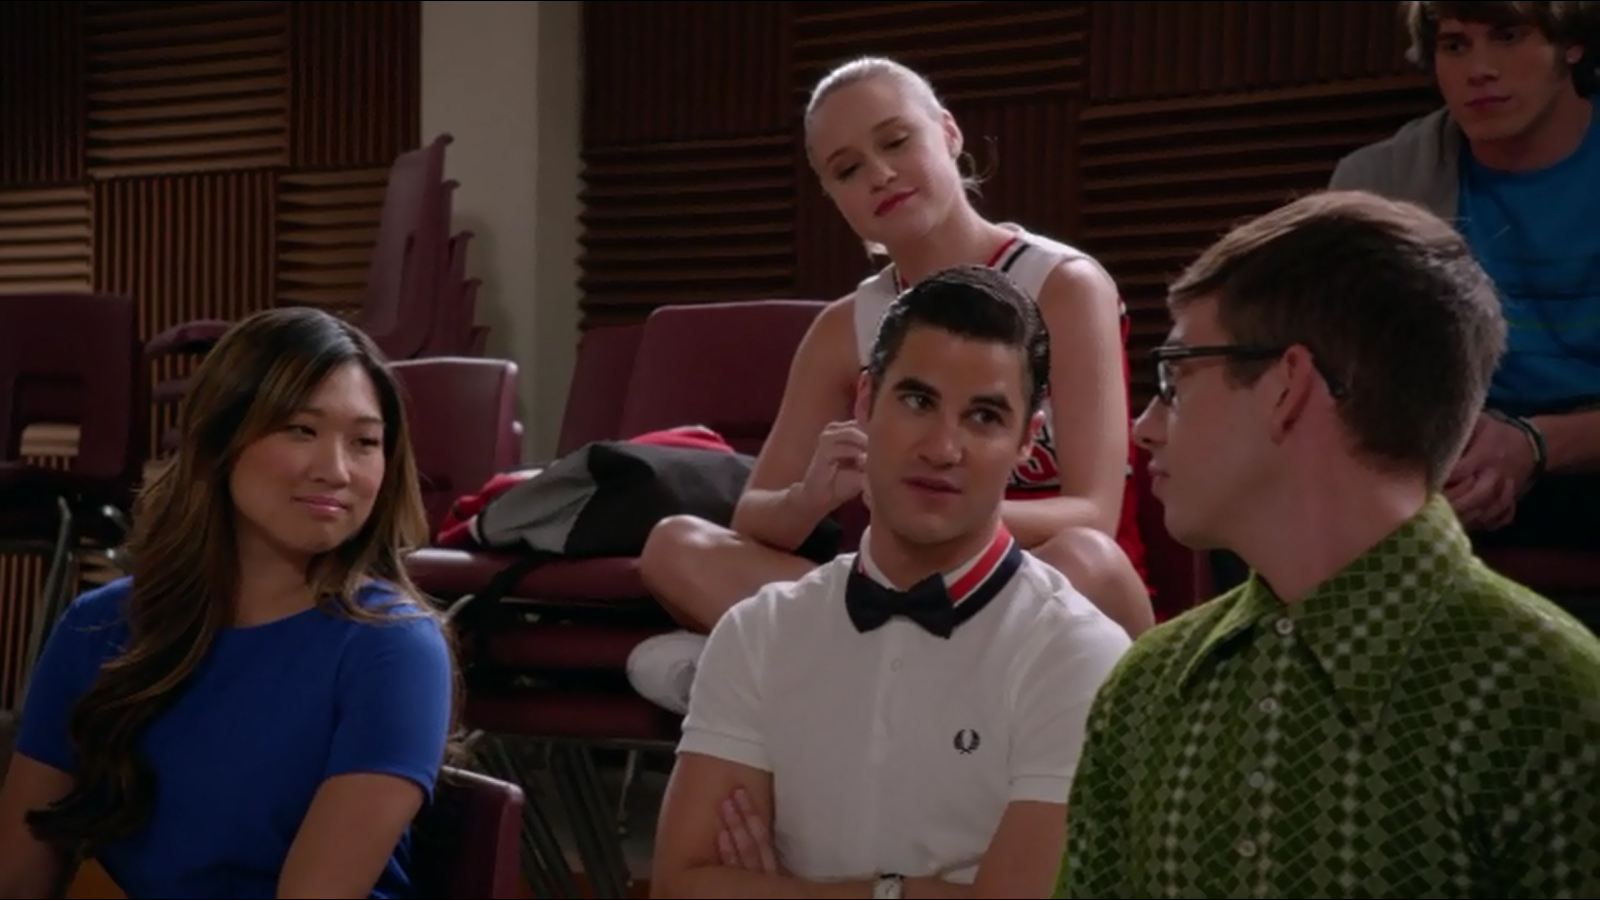 Glee artie and tina dating sim